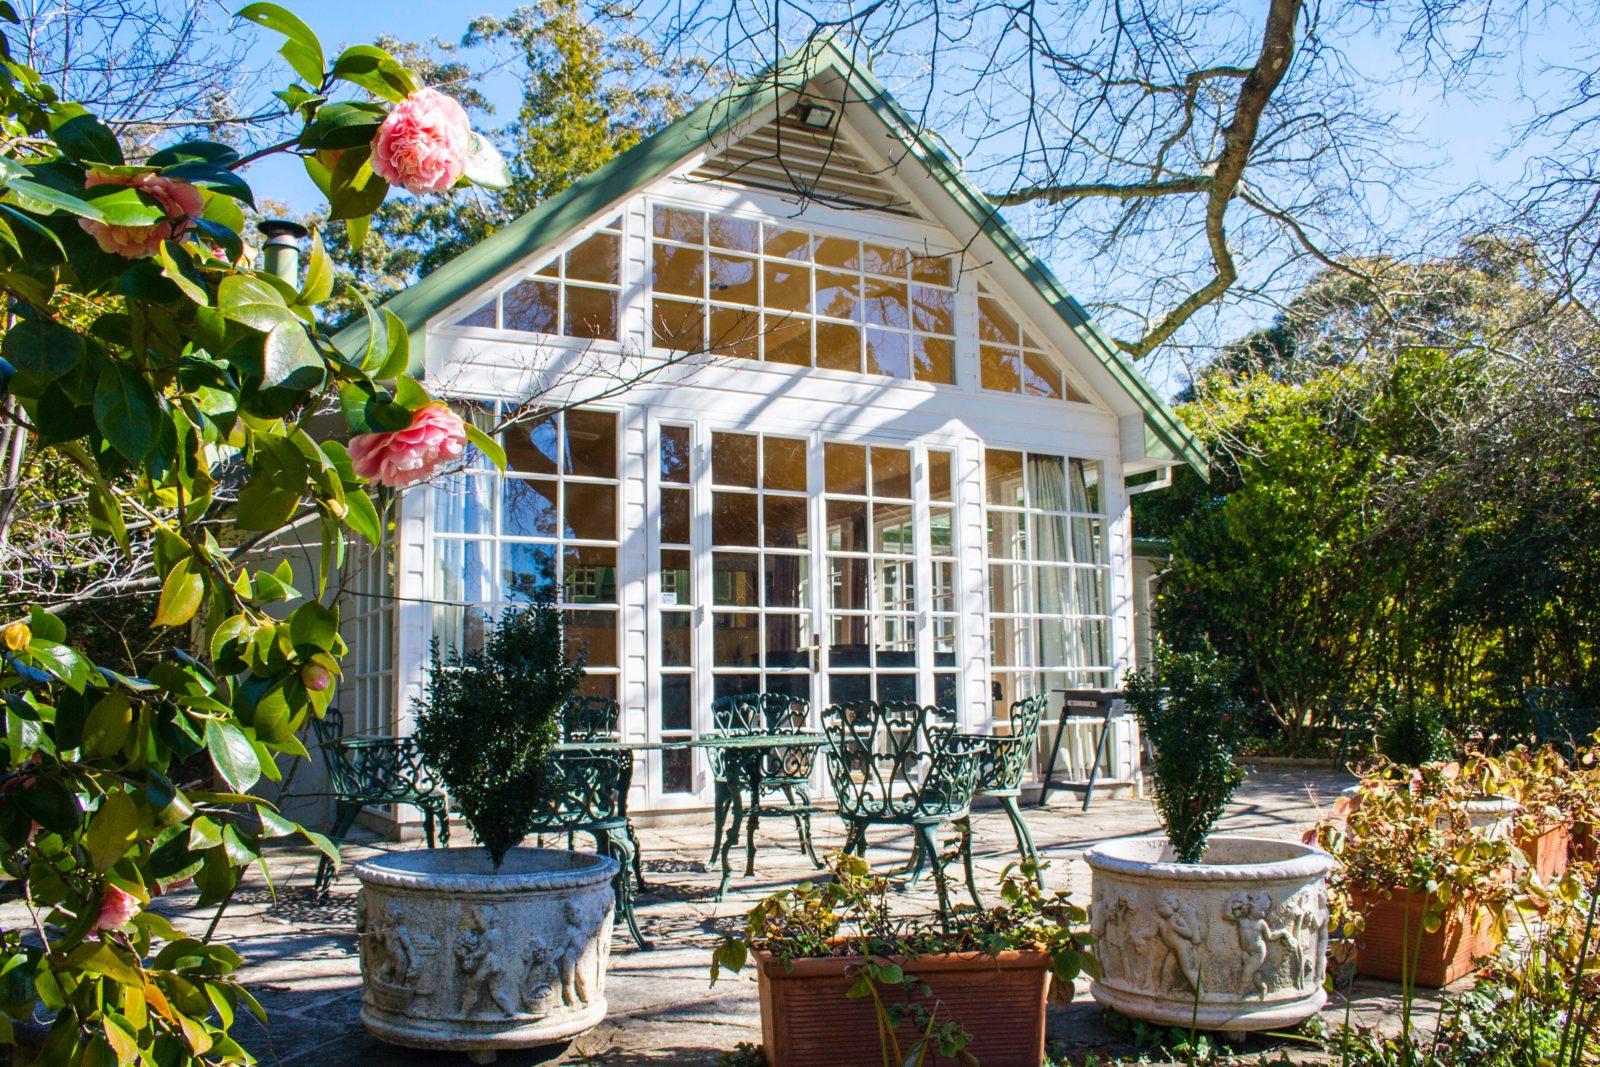 Bronte Cottage patio